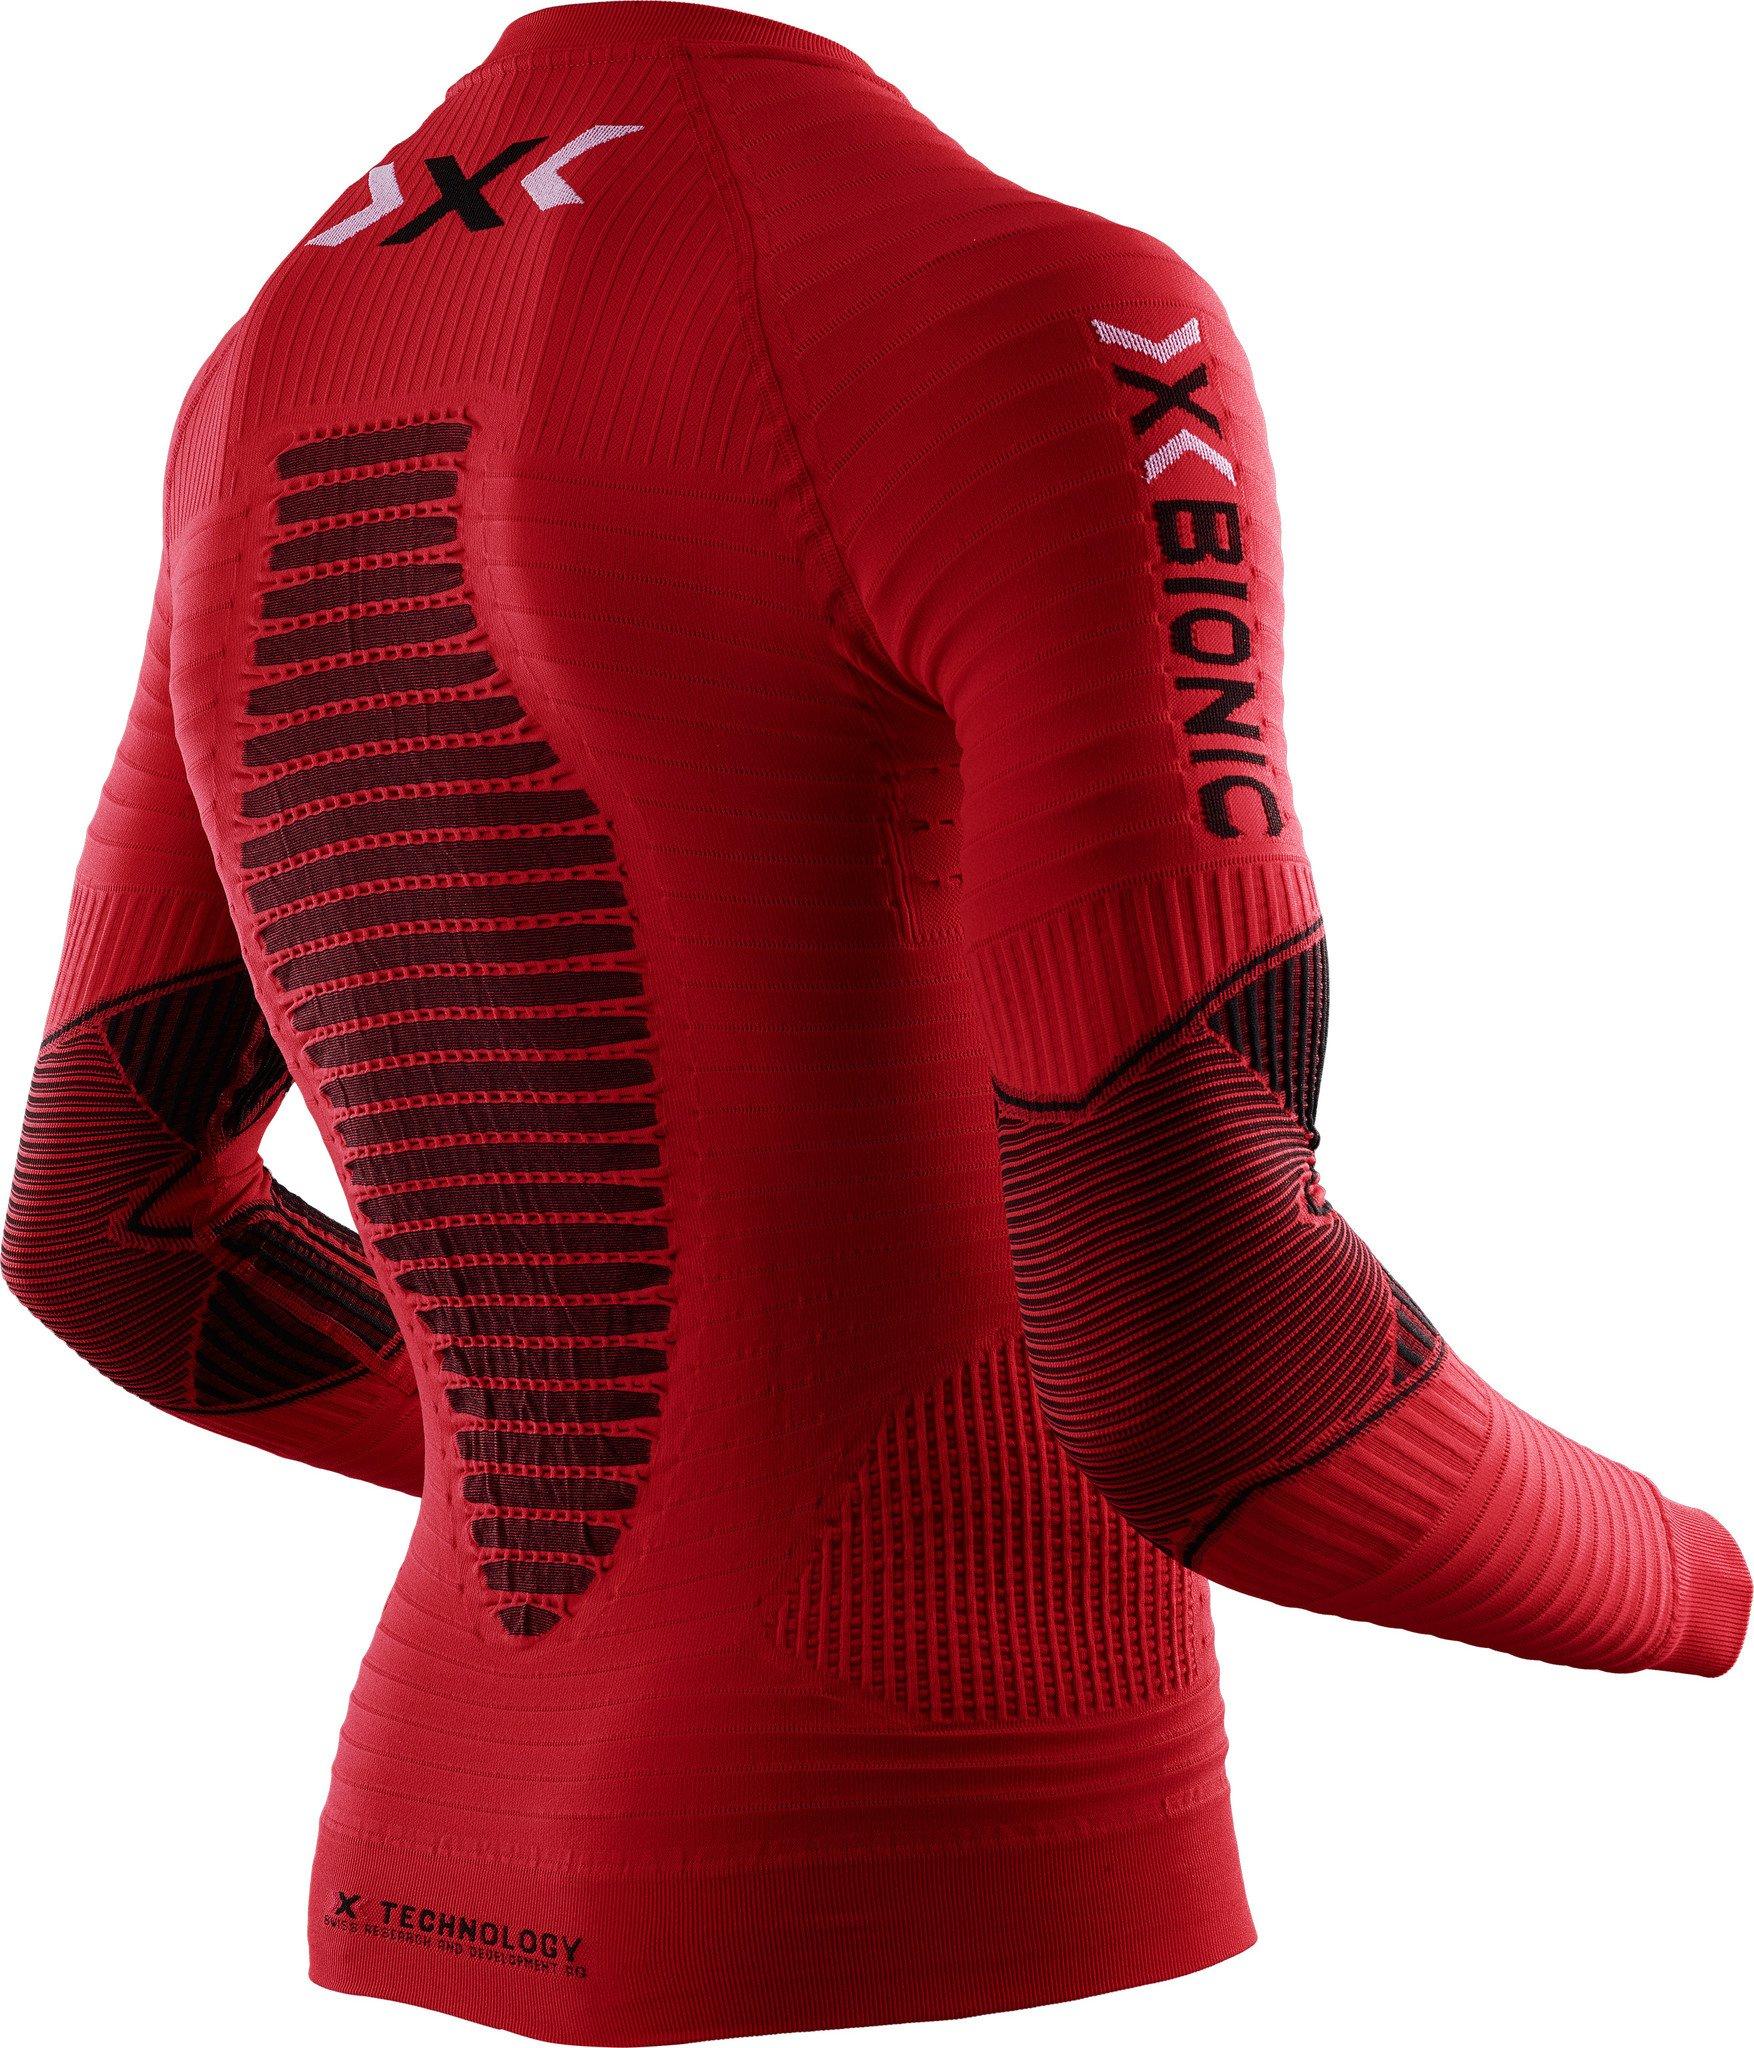 L Trerè Innovation O020570 Maglia Uomo X-Bionic Running Effektor Power Ow Lg_ Sl Rosso/Nero